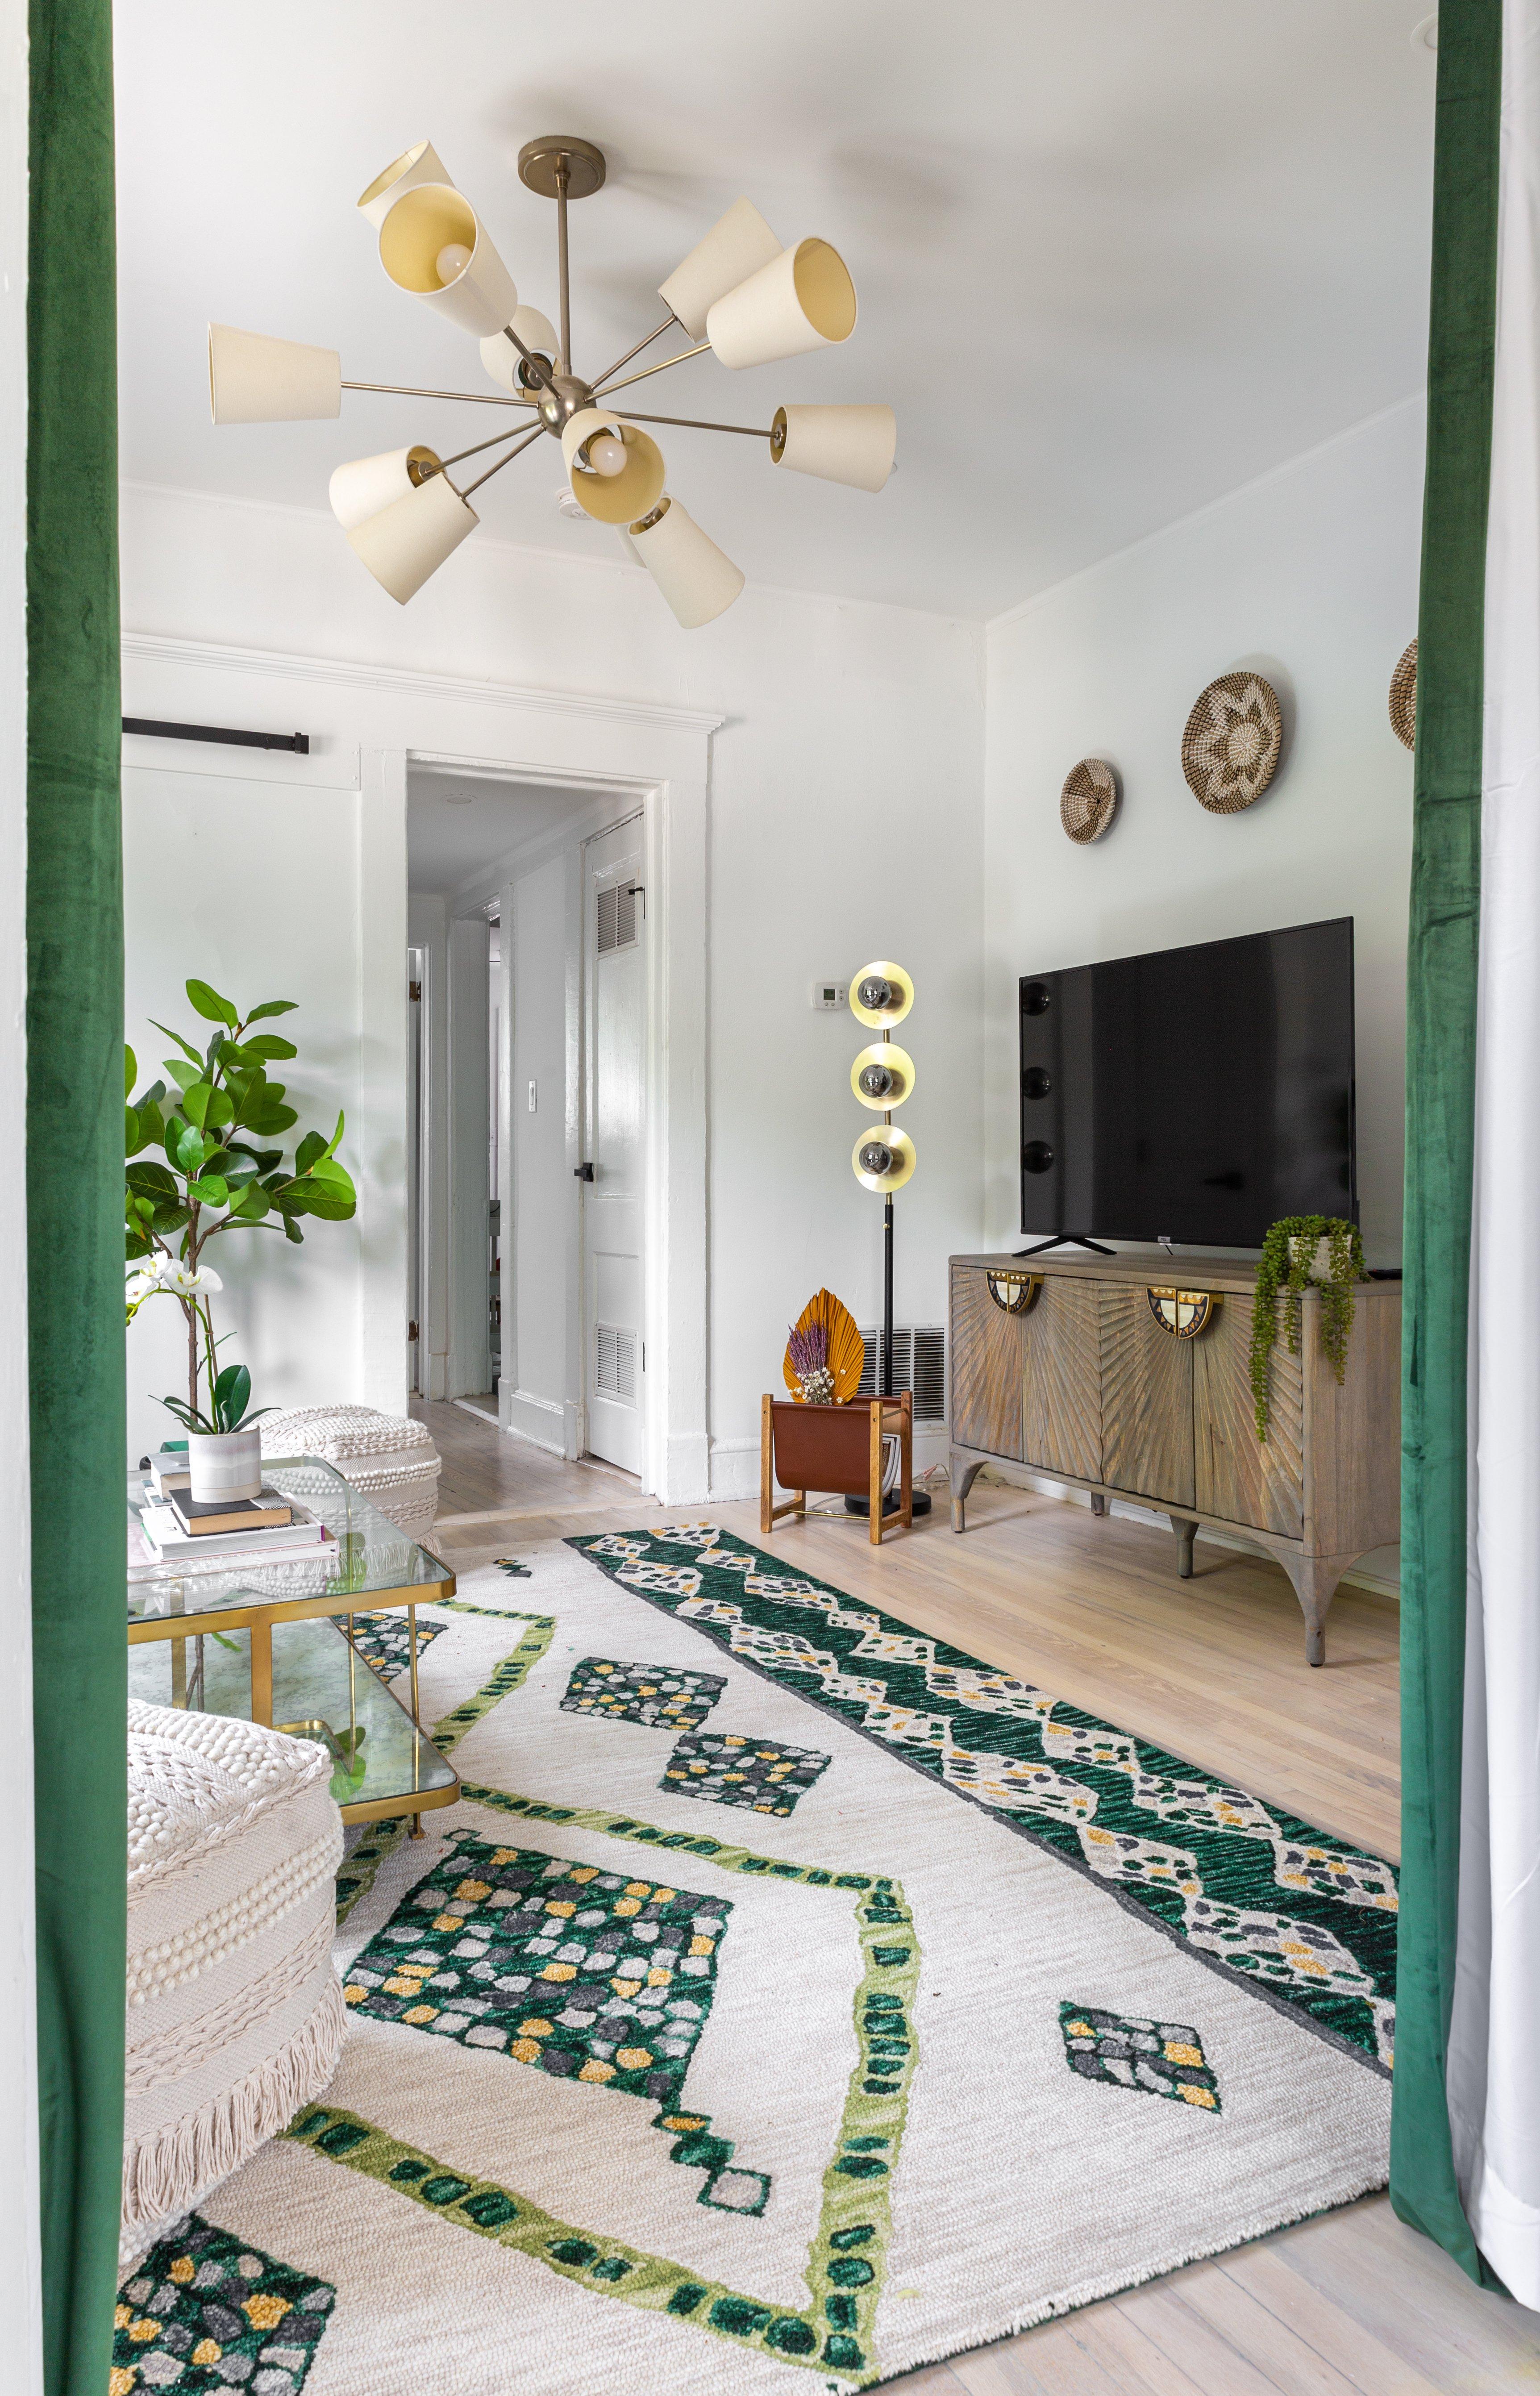 20 livingroom untitledswim-meet-2-10.jpg